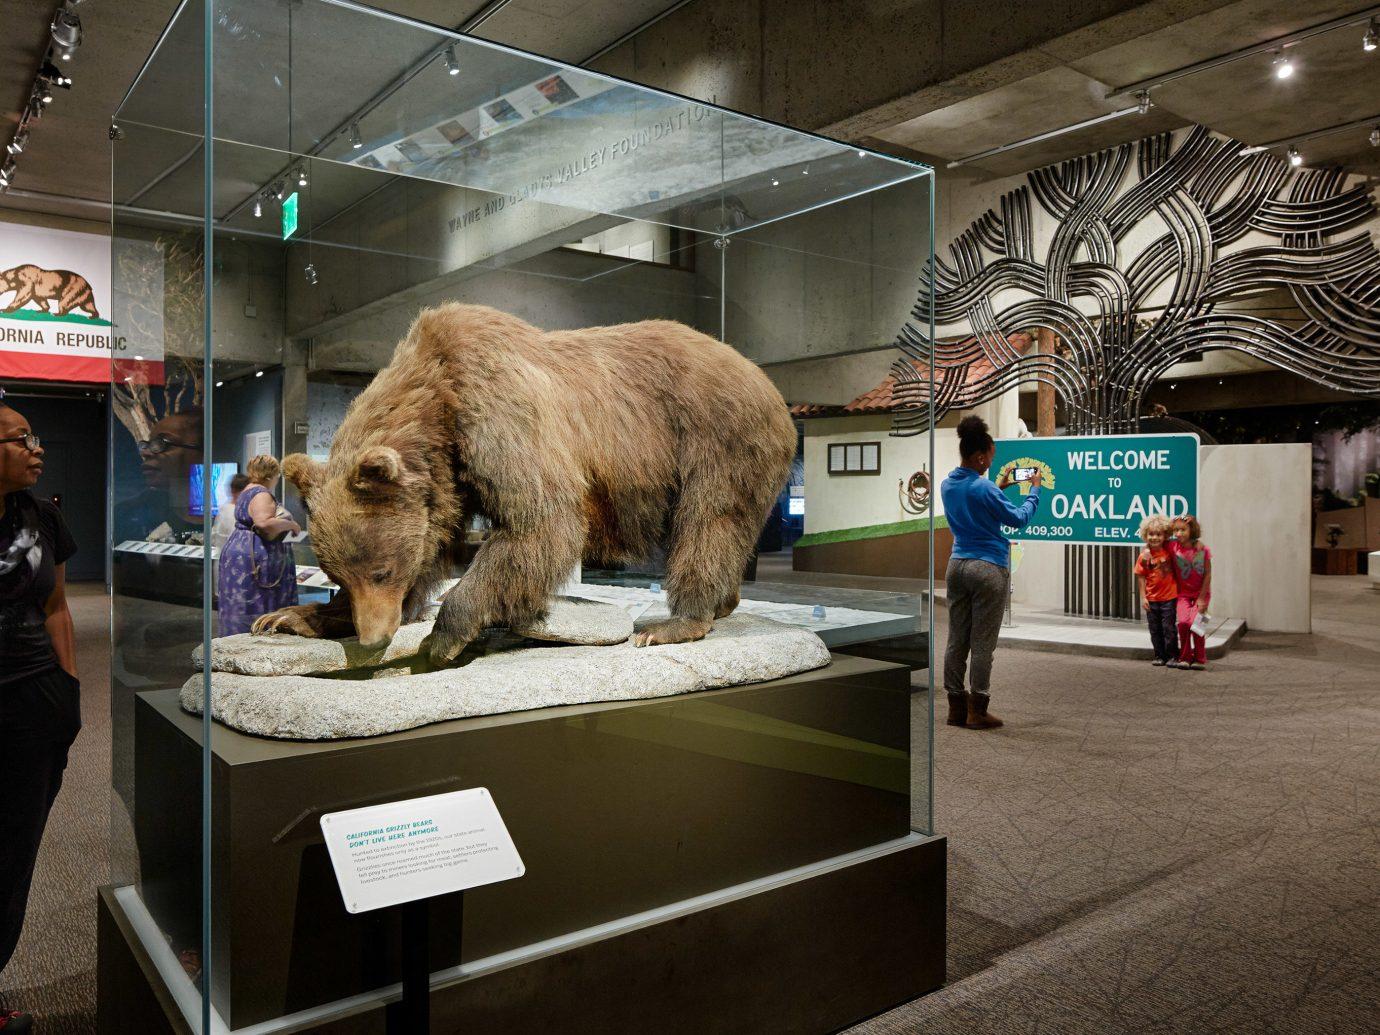 Trip Ideas indoor ceiling fair art tourist attraction exhibition mammal